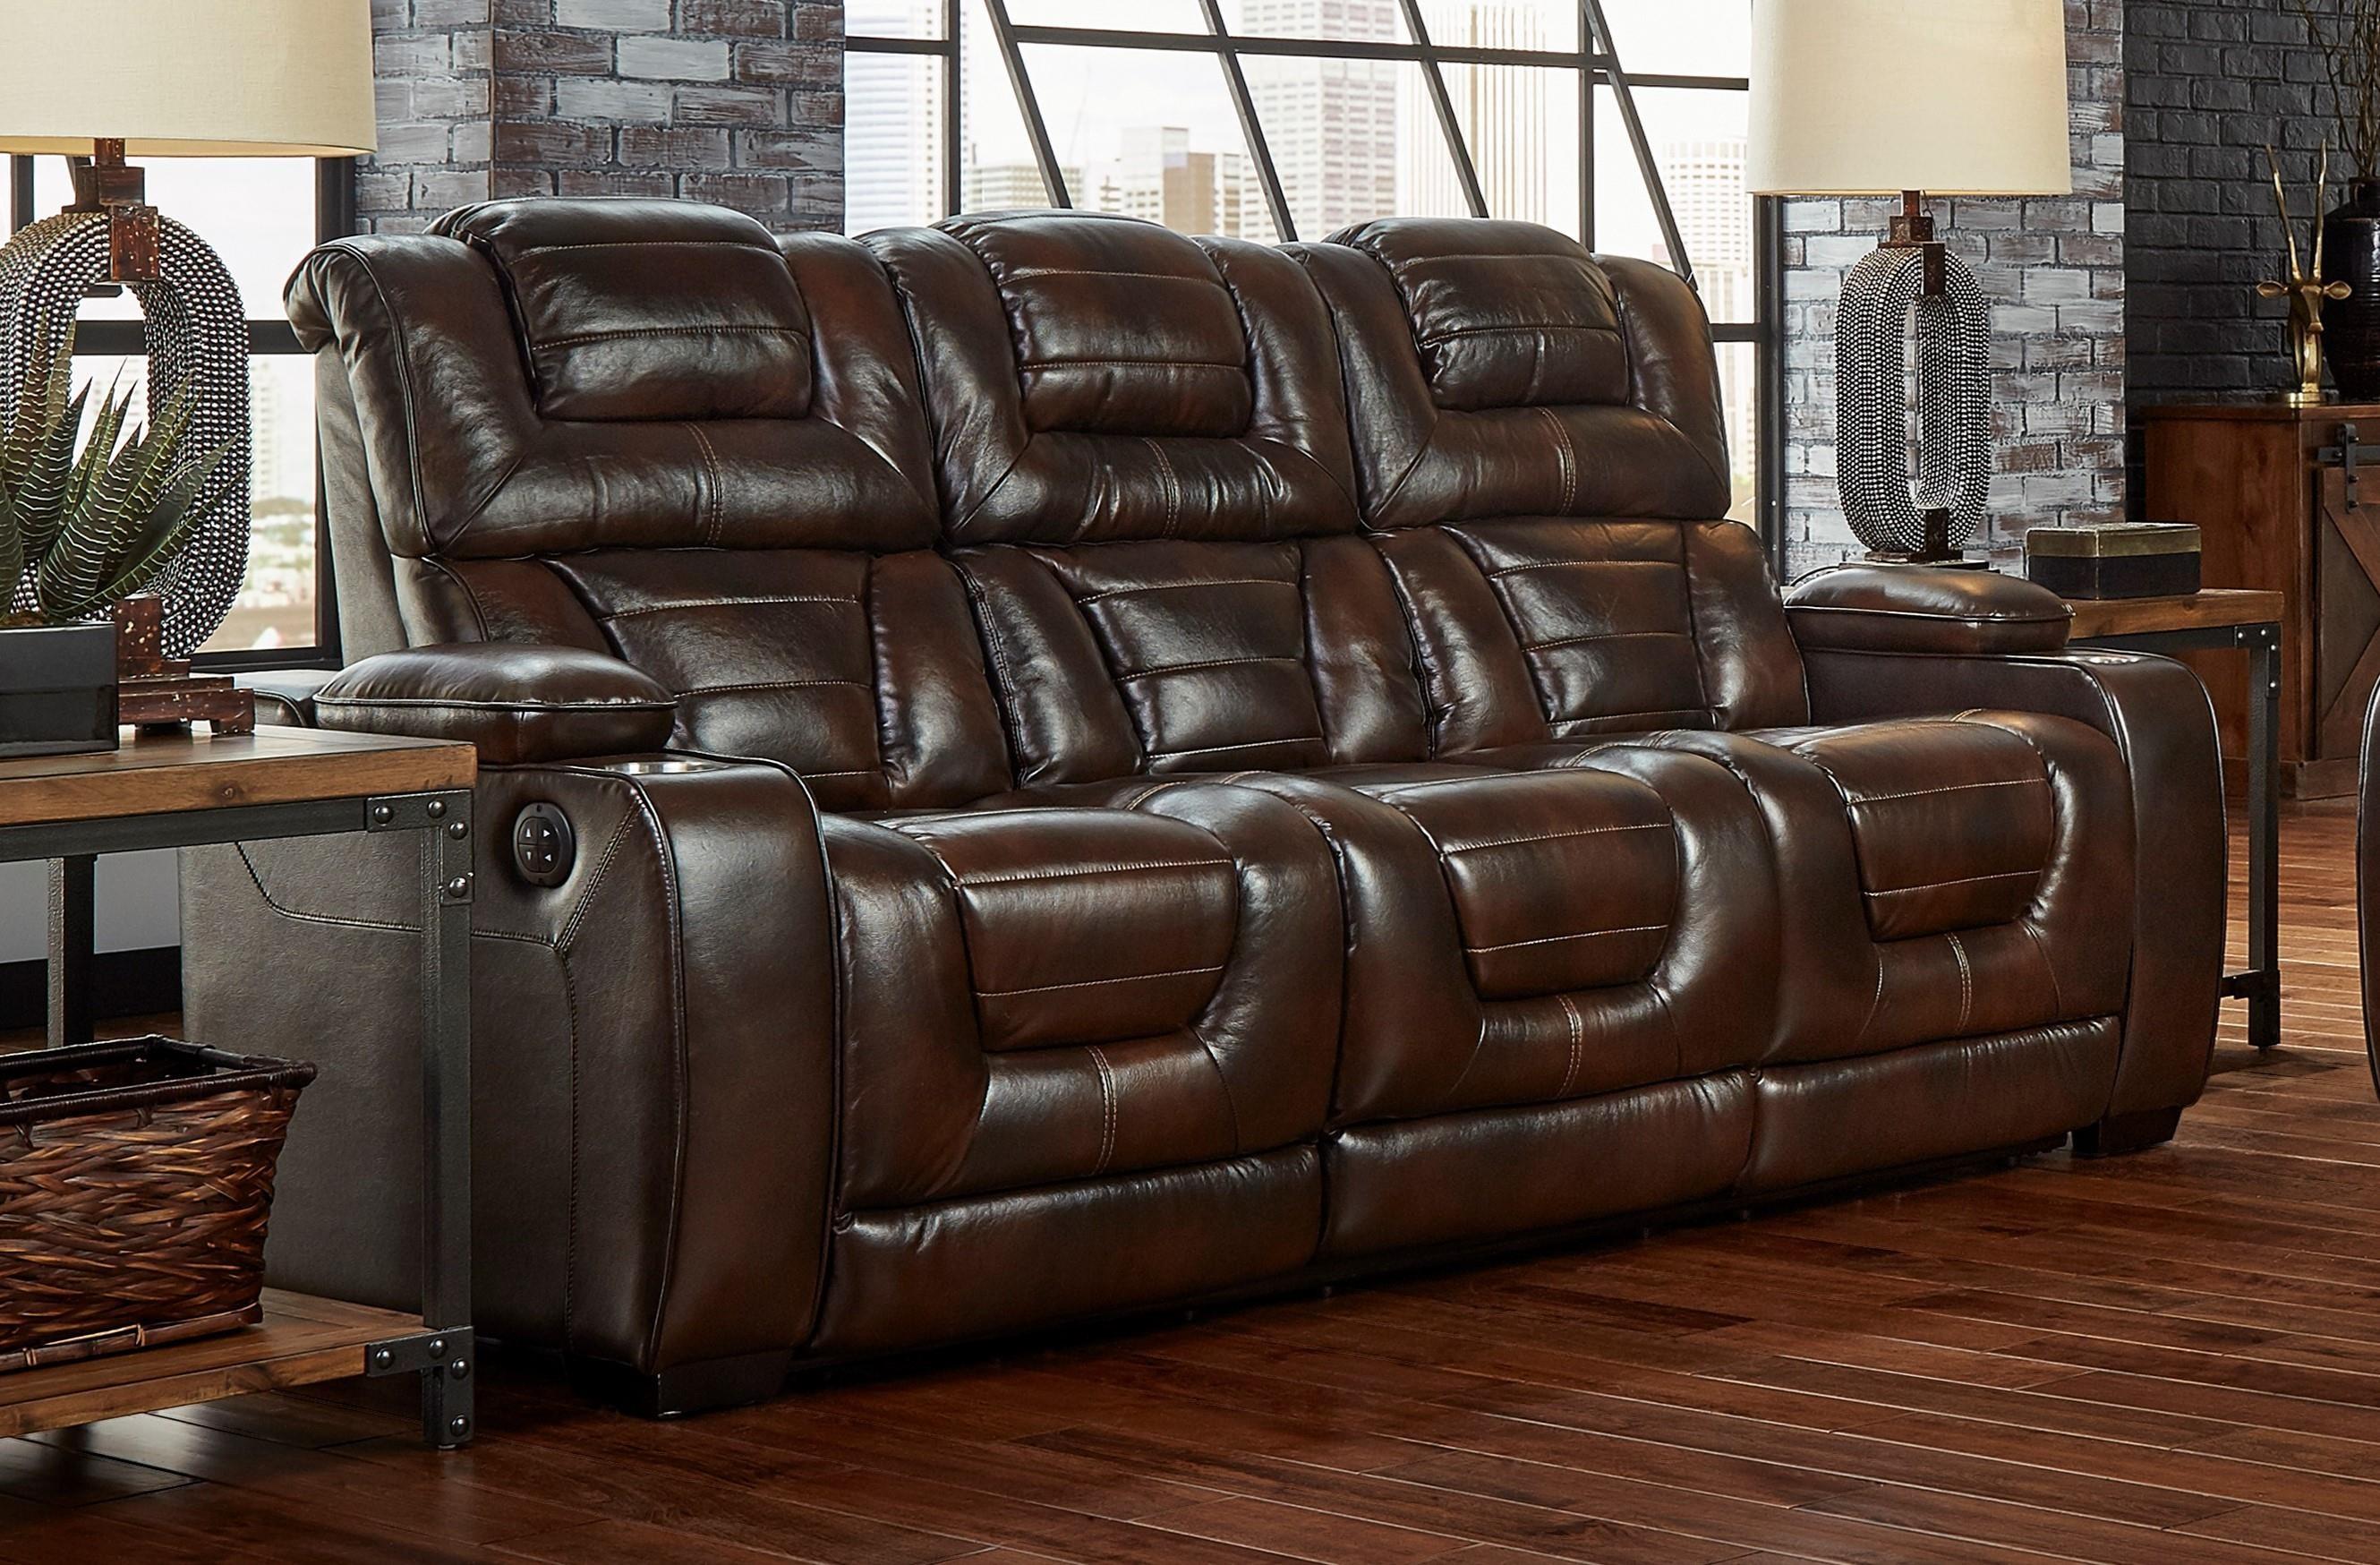 L73901 Power Headrest Recline Sofa by Corinthian at Furniture Fair - North Carolina